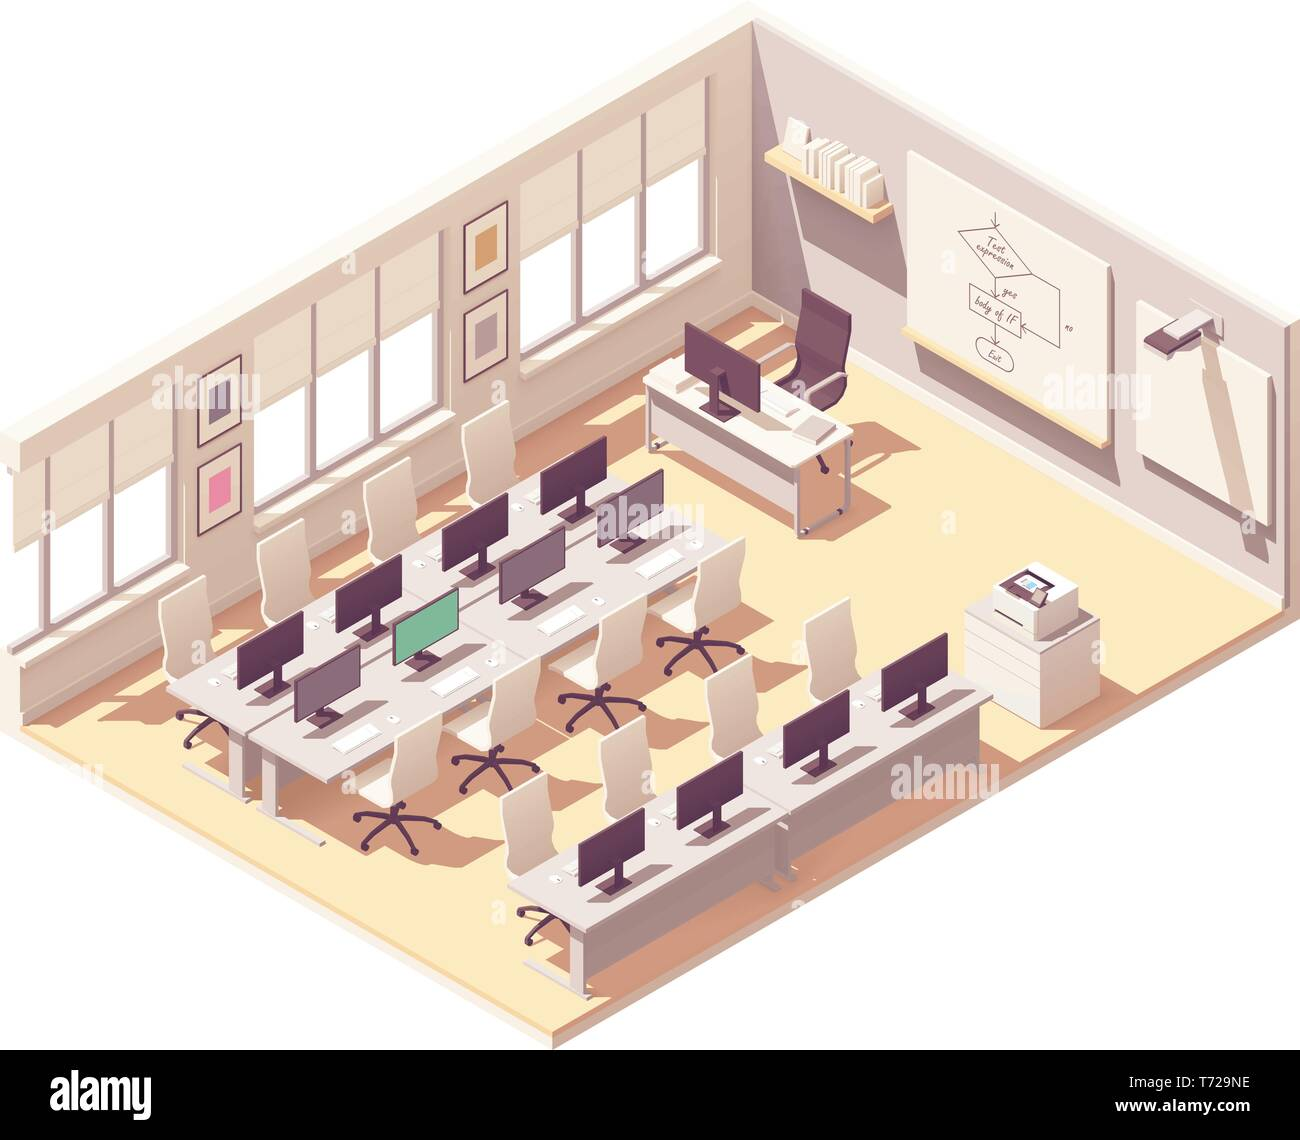 Vector Isometric Computer Lab Classroom Stock Vector Image Art Alamy